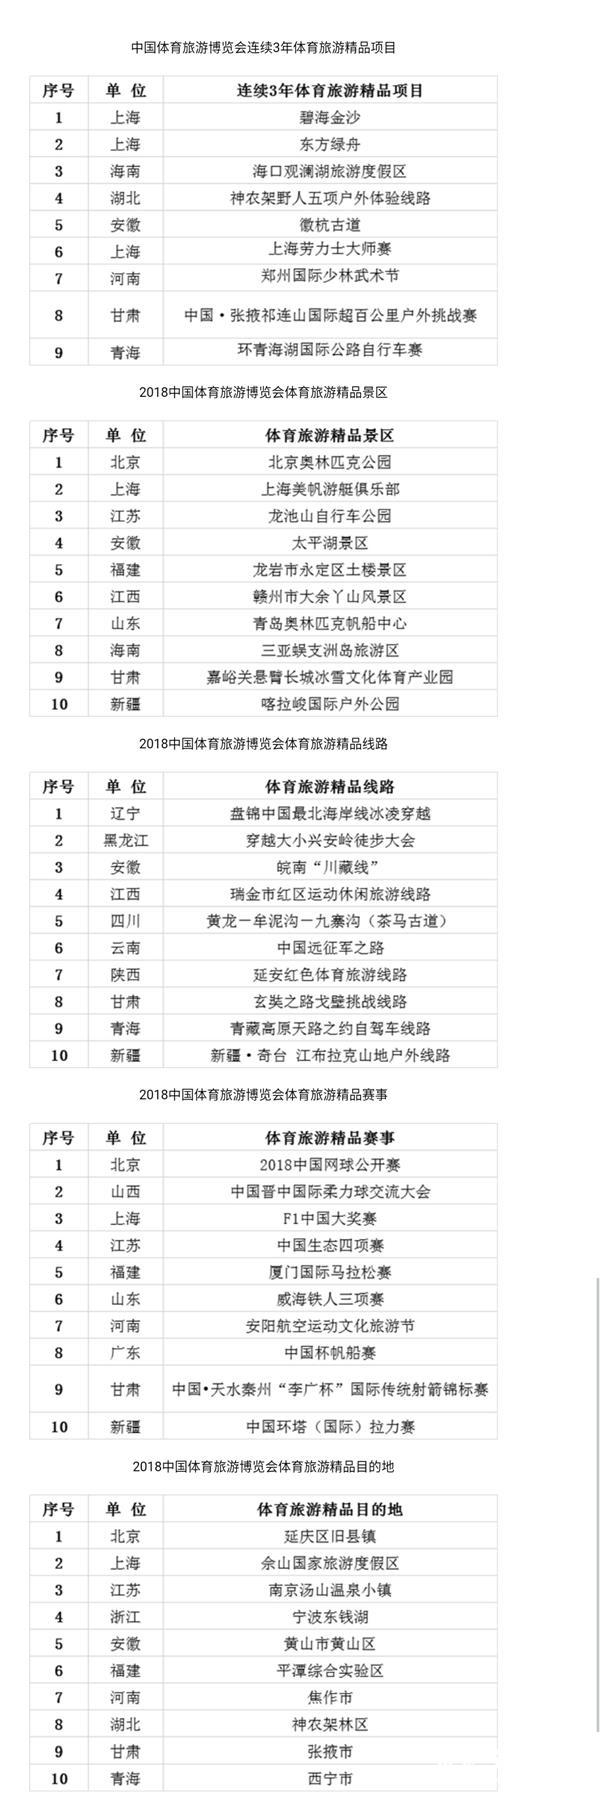 fb3c7459a6c23509099e6fd0739e137_看图王.jpg